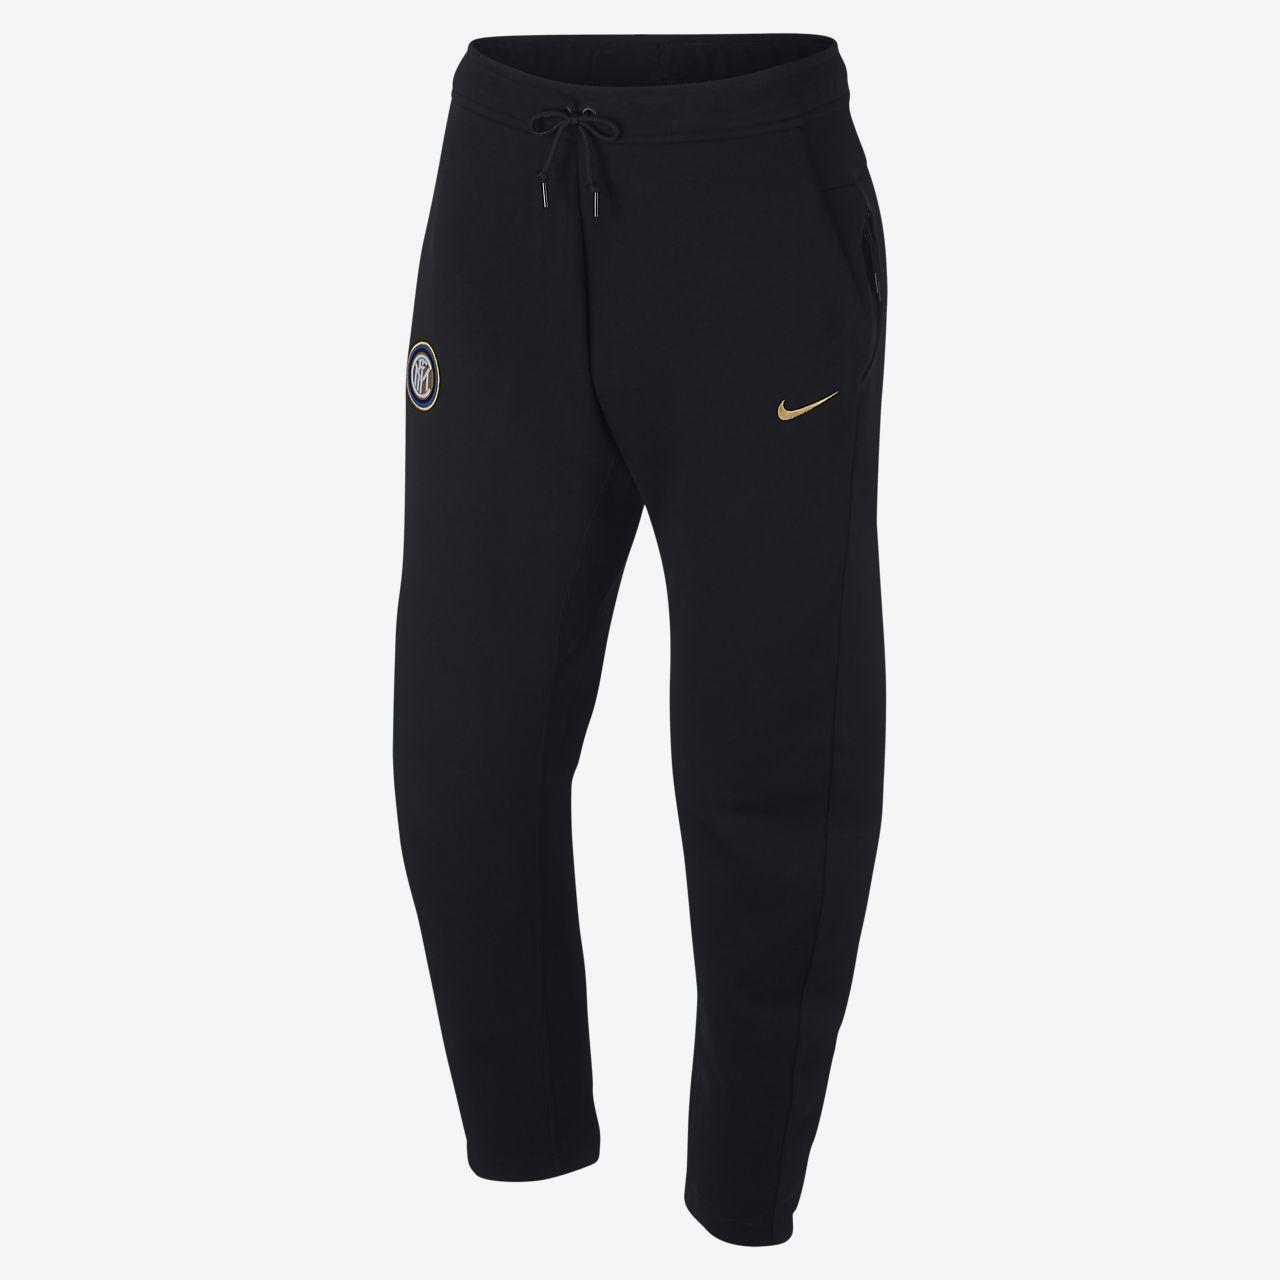 Pantalon Inter Milan Tech Fleece pour Homme